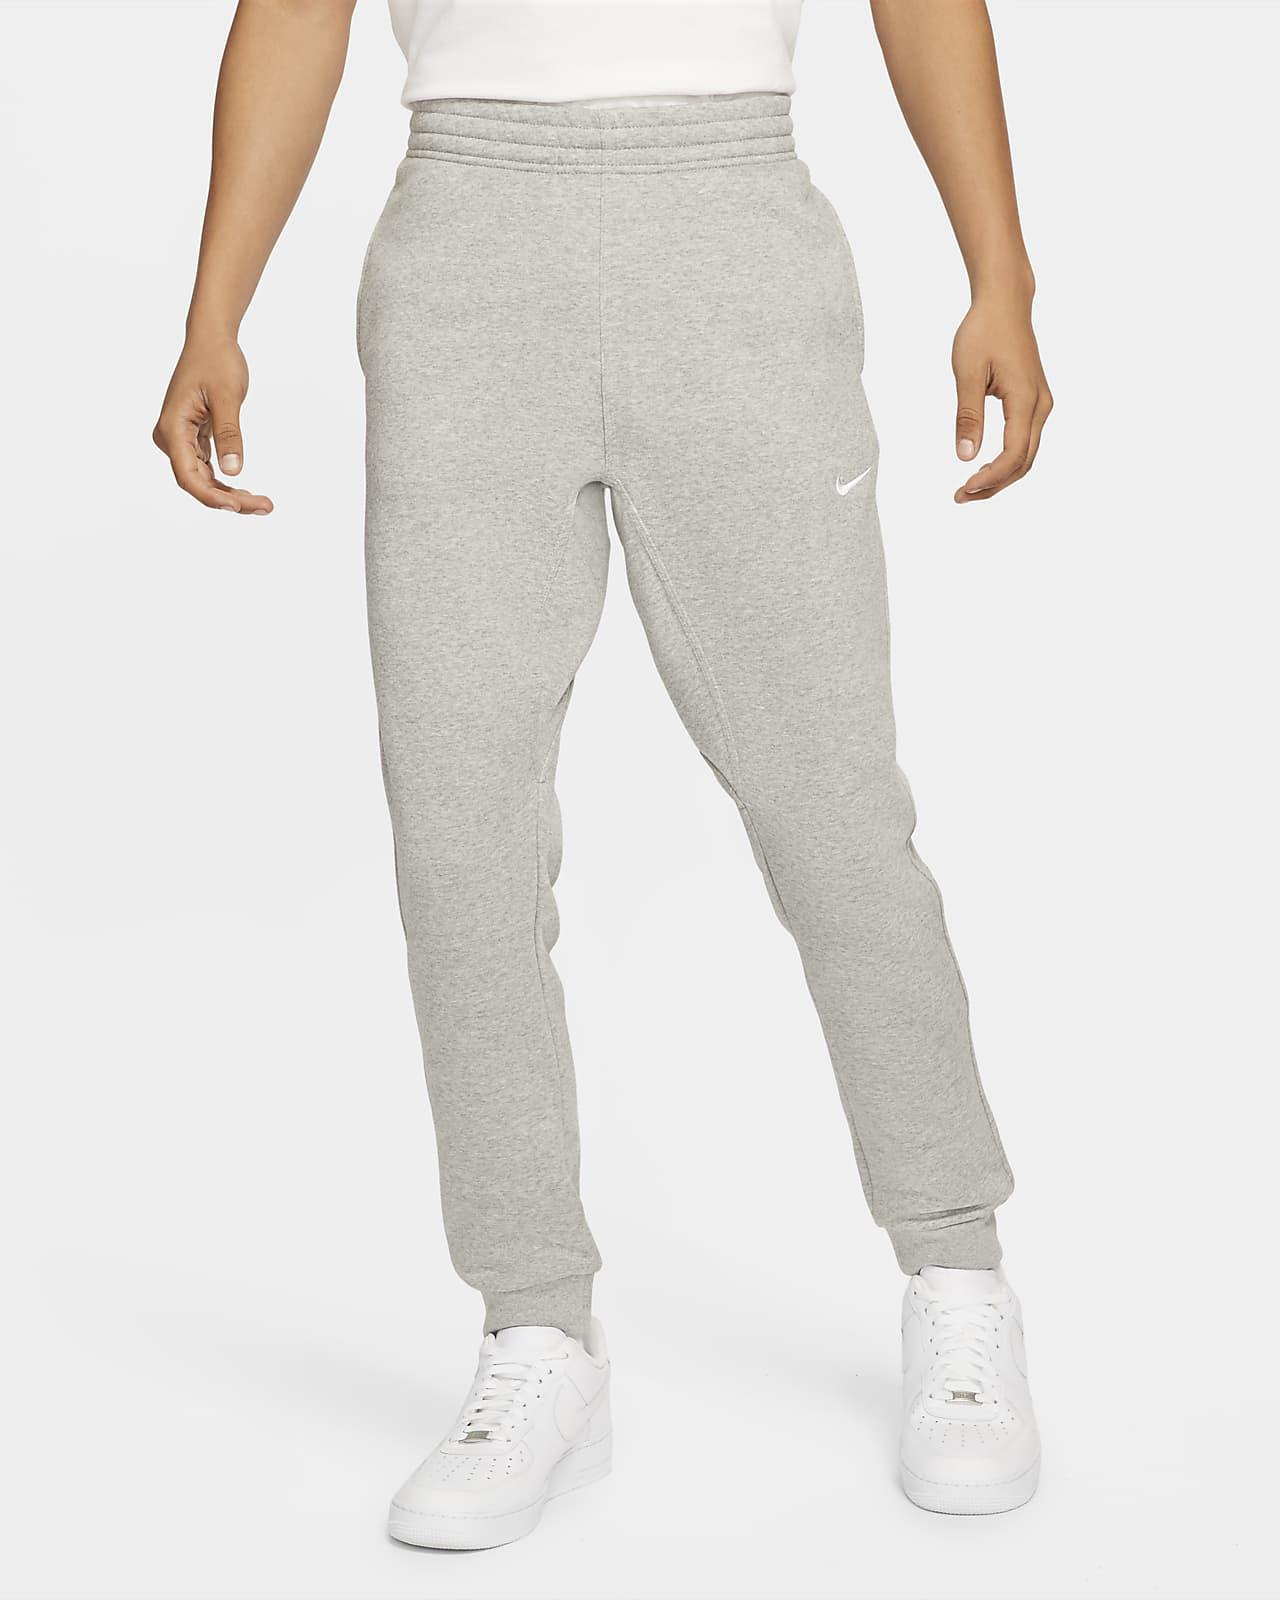 Pantalones ajustados para hombre Nike Sportswear Club Fleece